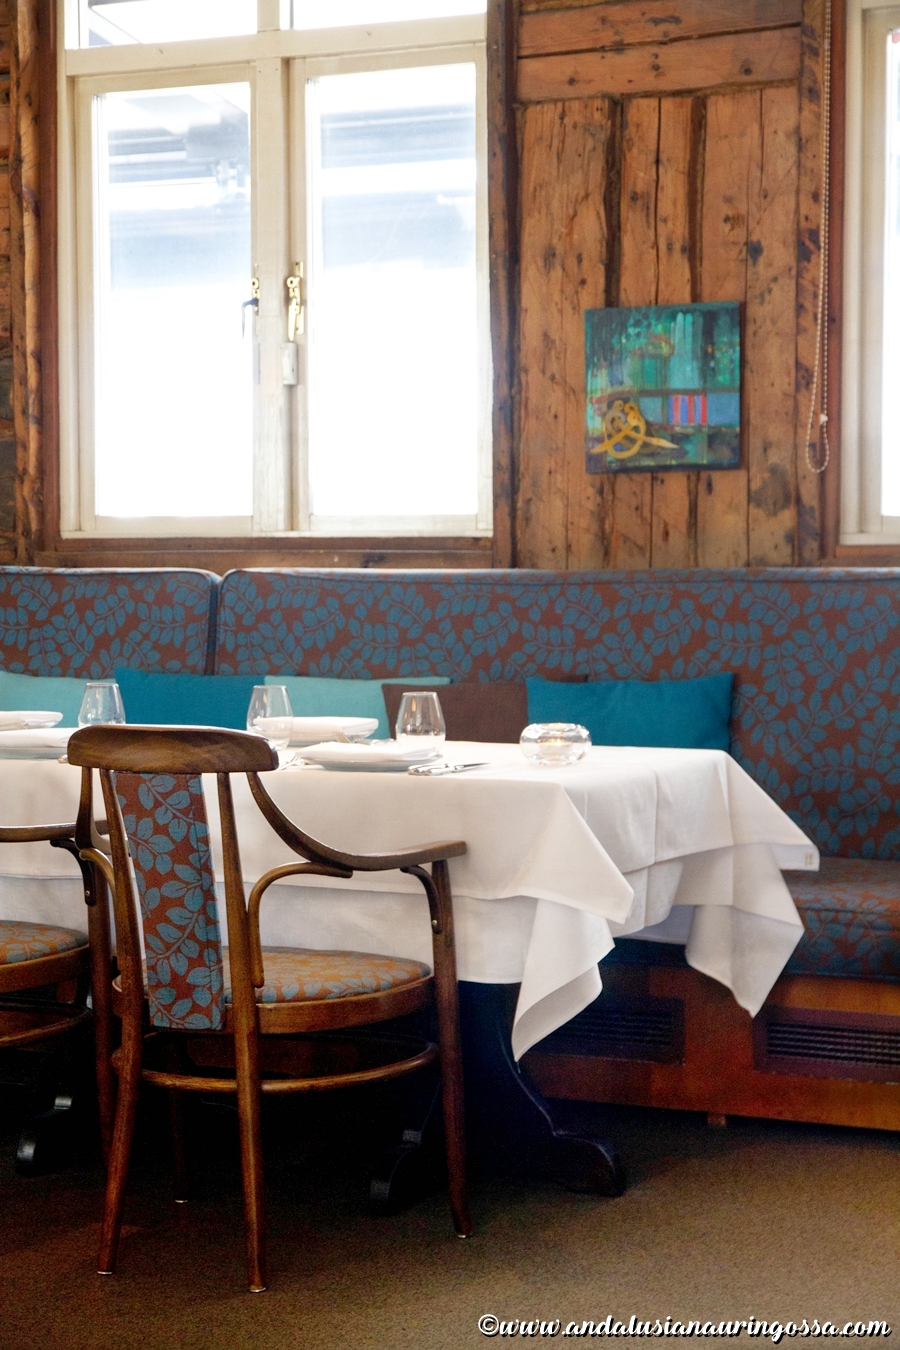 Sjomagasinet_Goteborg_Michelin ravintola_ravintolasuositus_Andalusian Auringossa_ruokablogi_matkablogi_4